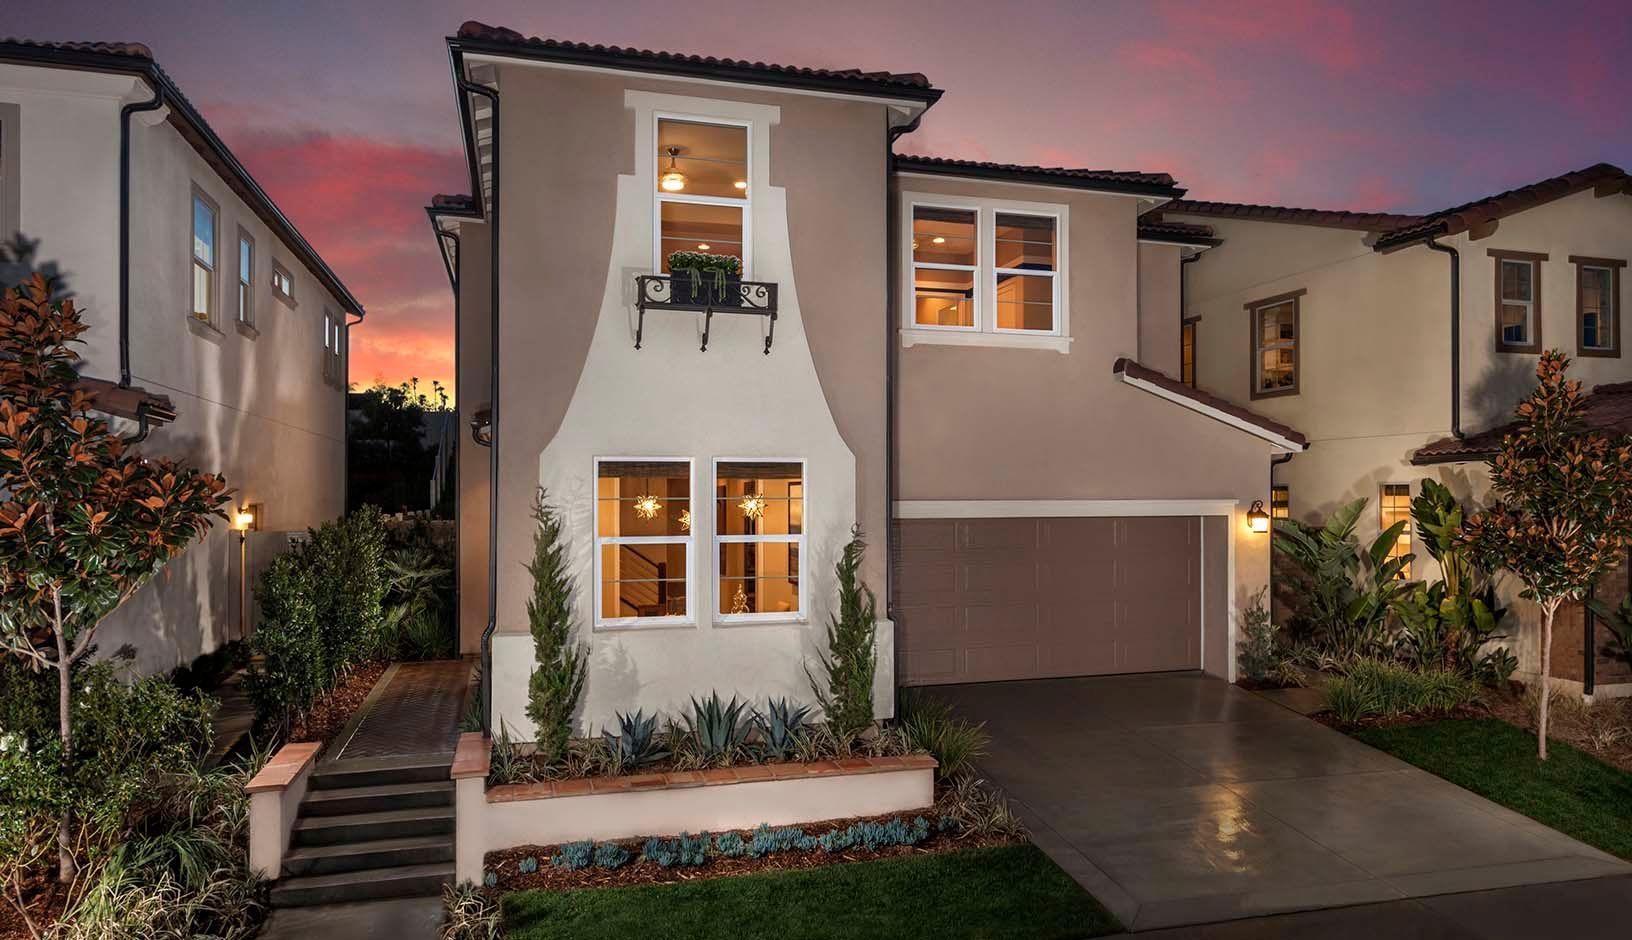 Unifamiliar por un Venta en Terrassa Villas - Residence 2 2830 Villa Catalonia Court Corona, California 92881 United States